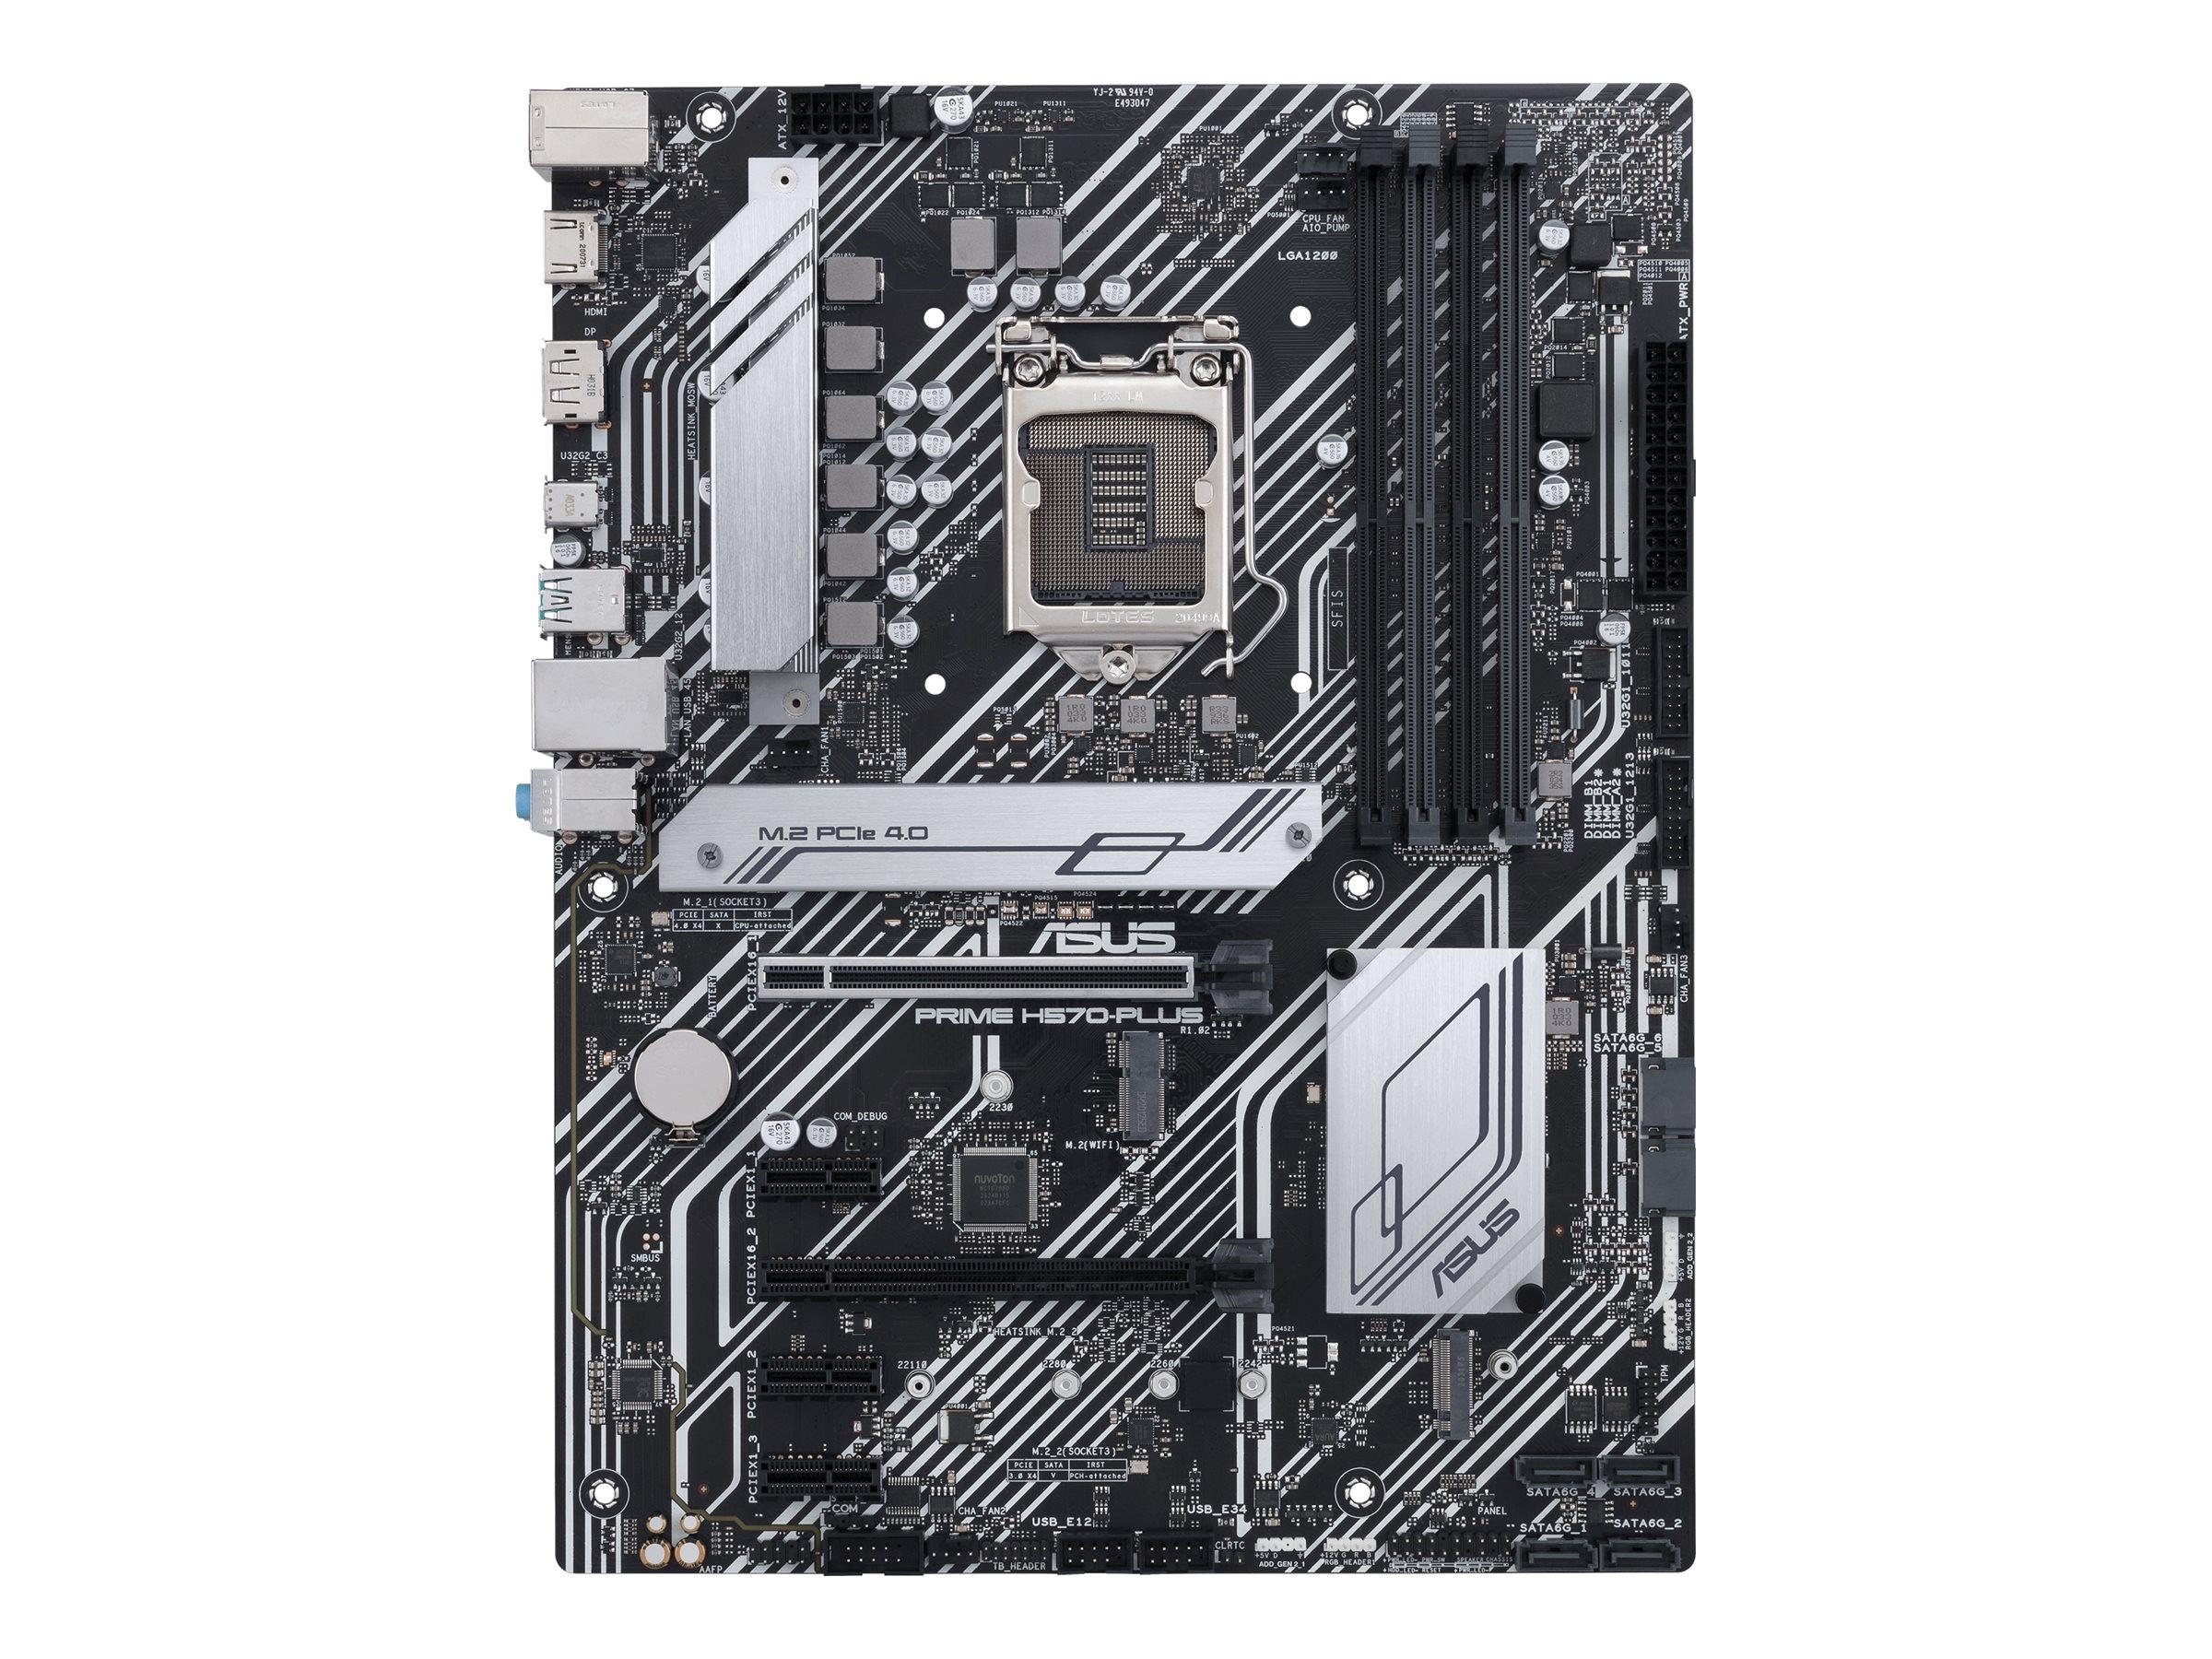 Vorschau: ASUS PRIME H570-PLUS - Motherboard - ATX - LGA1200-Sockel - H570 - USB-C Gen2, USB 3.2 Gen 1, USB 3.2 Gen 2 - Gigabit LAN - Onboard-Grafik (CPU erforderlich)